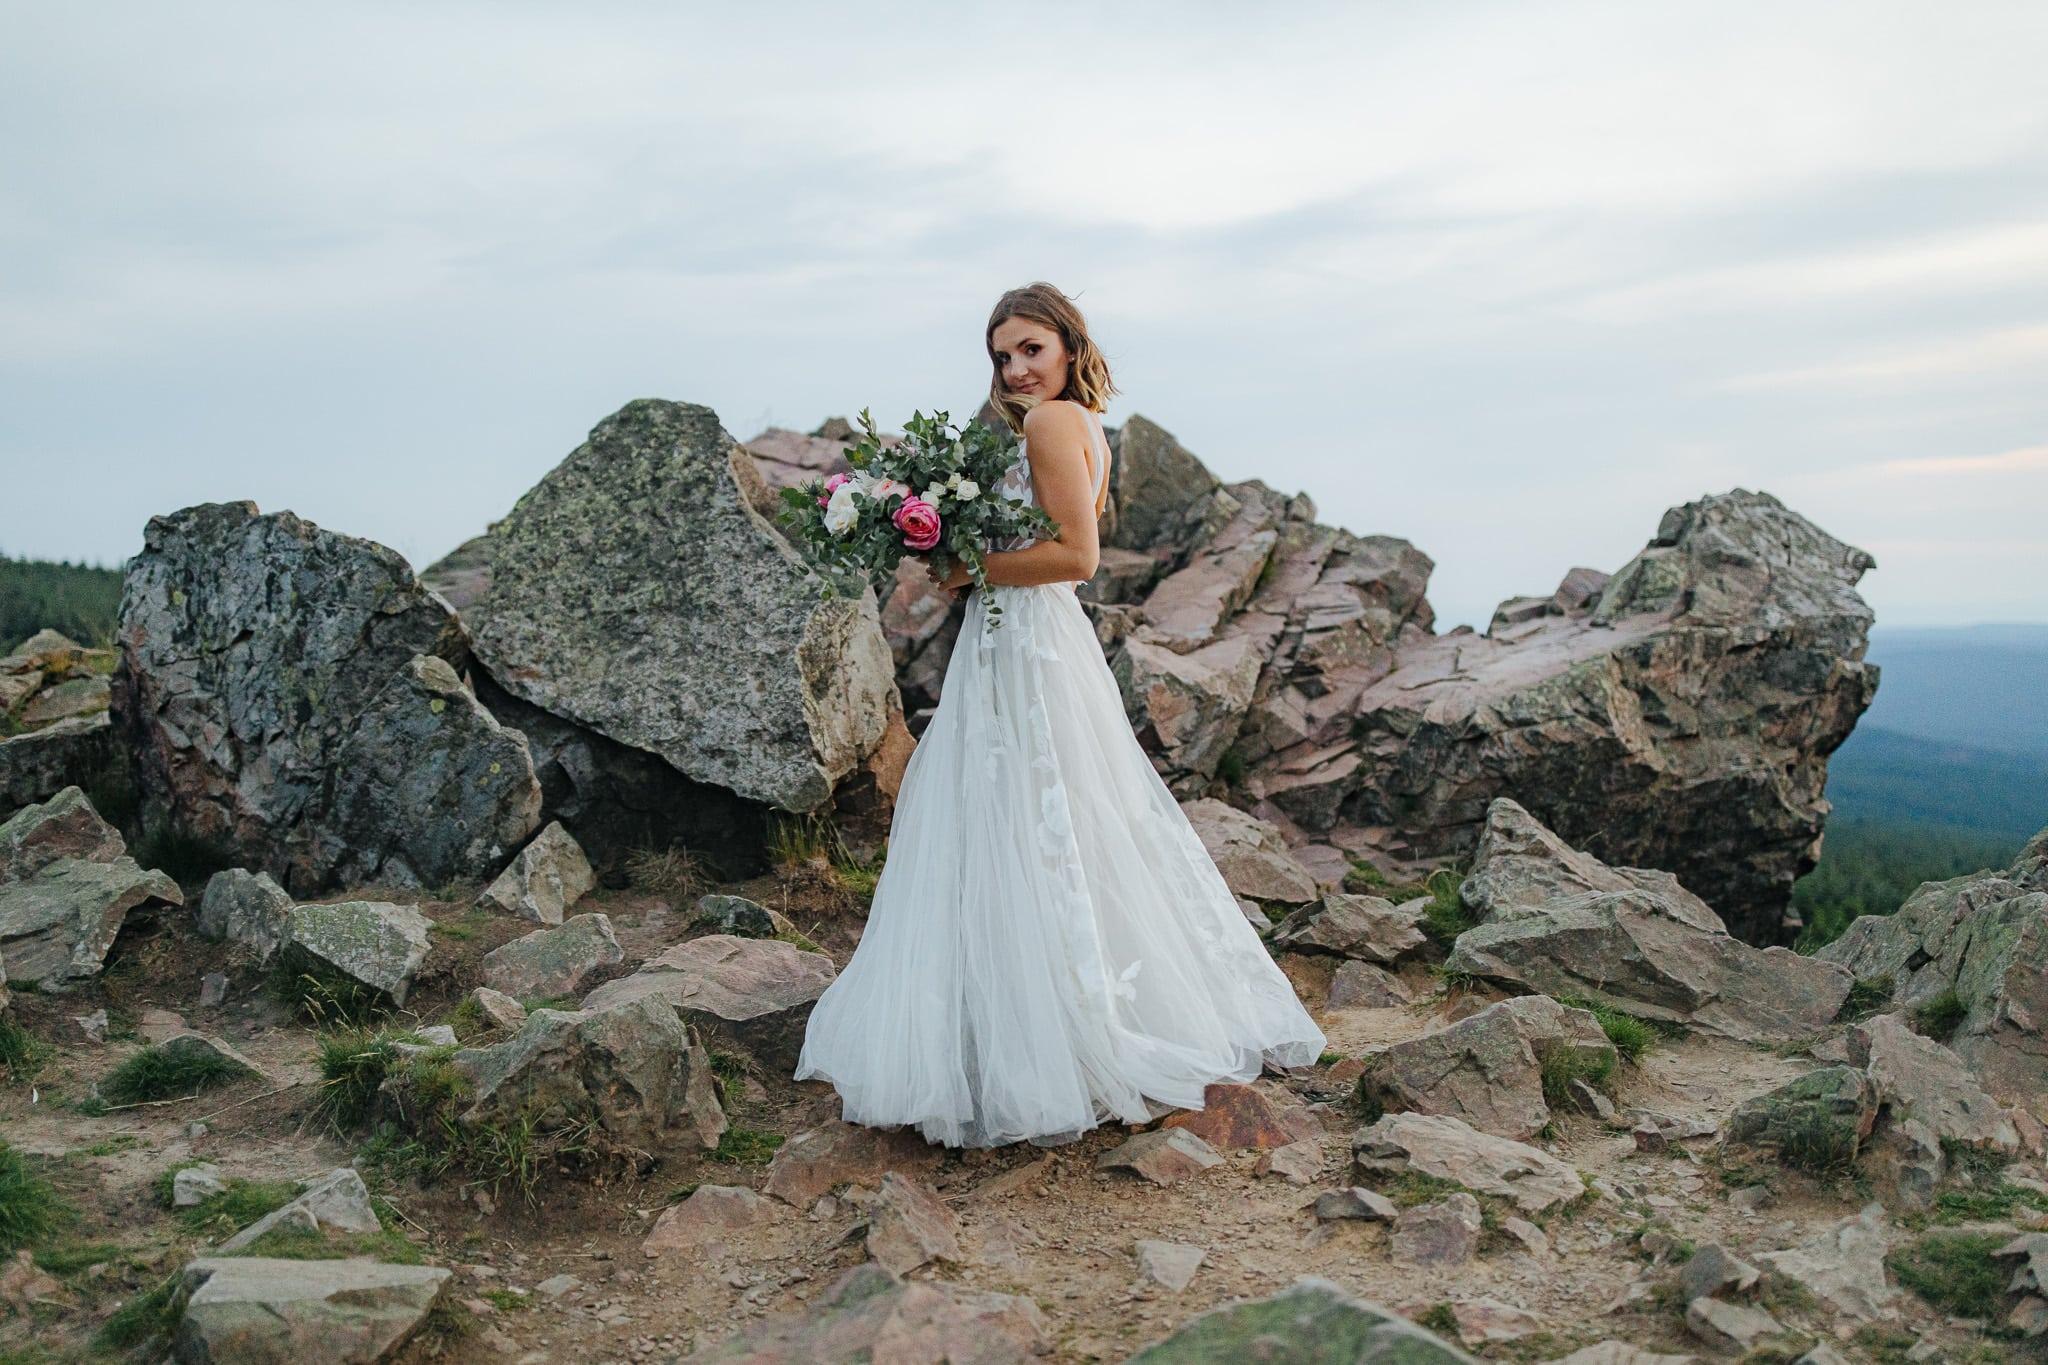 michael-palatini-mountain-bride-wedding